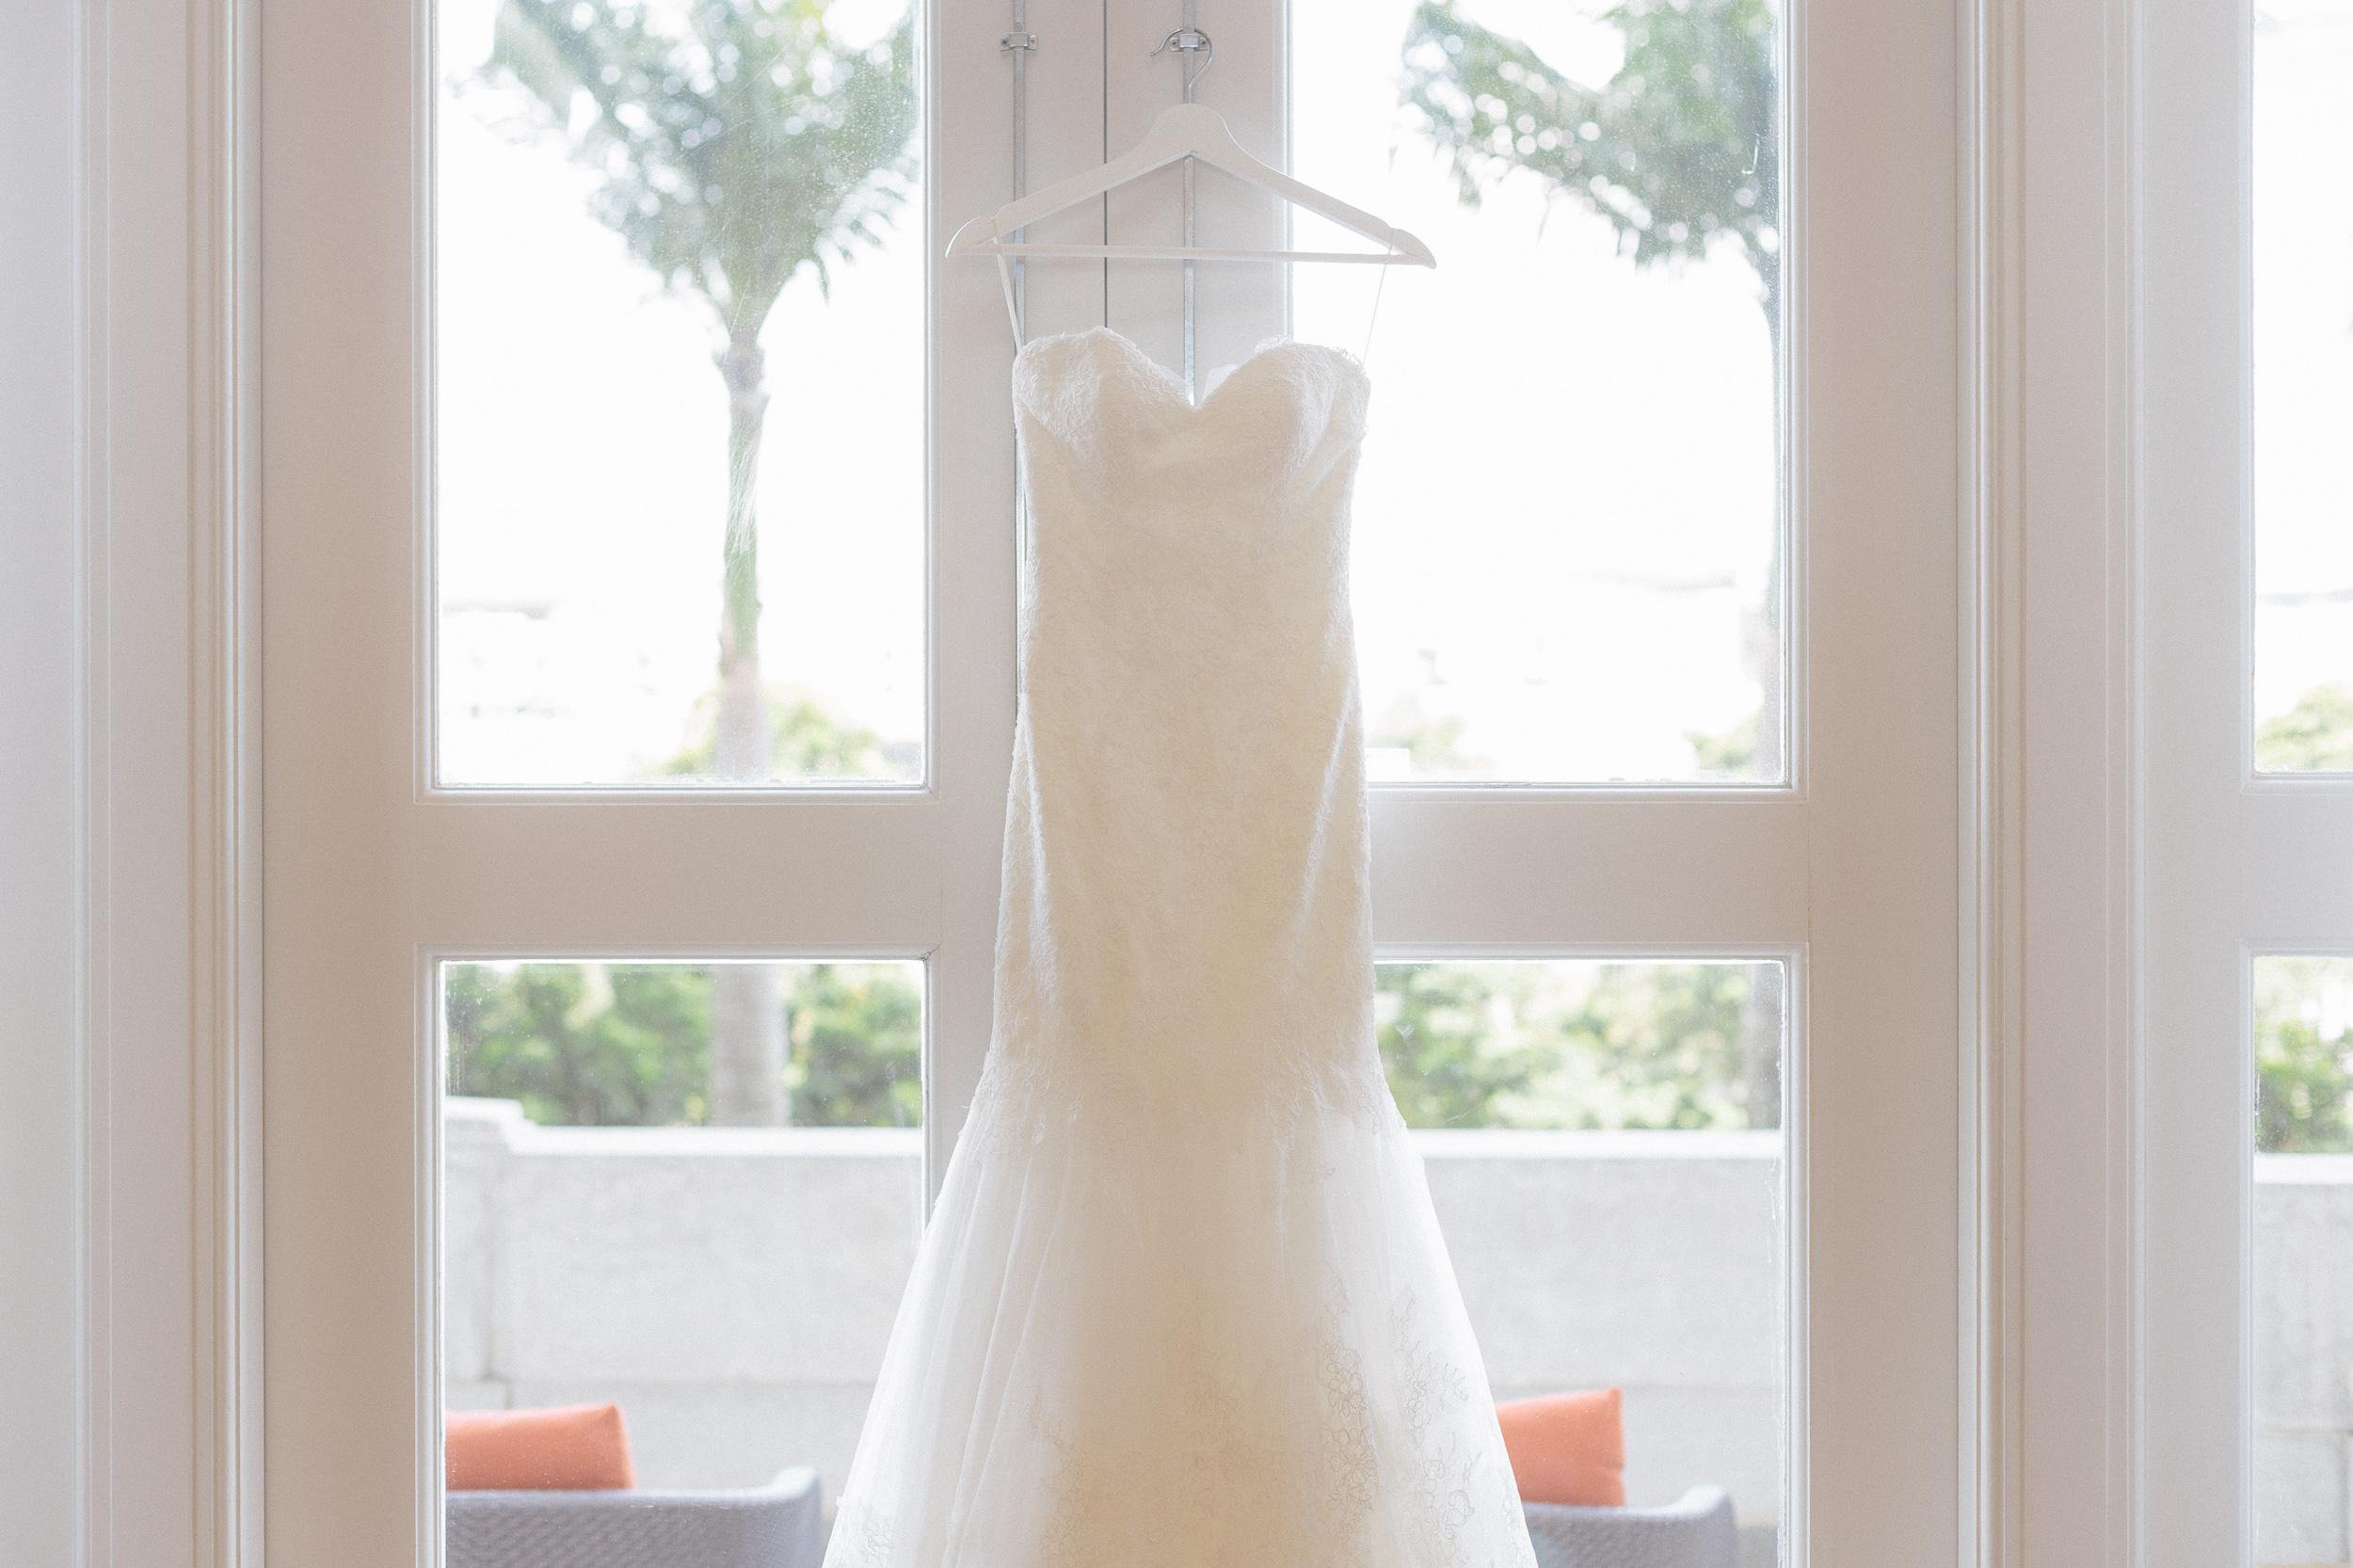 singapore-wedding-photographer-cheryl-matthew-fullerton-hotel-wedding-34.jpg